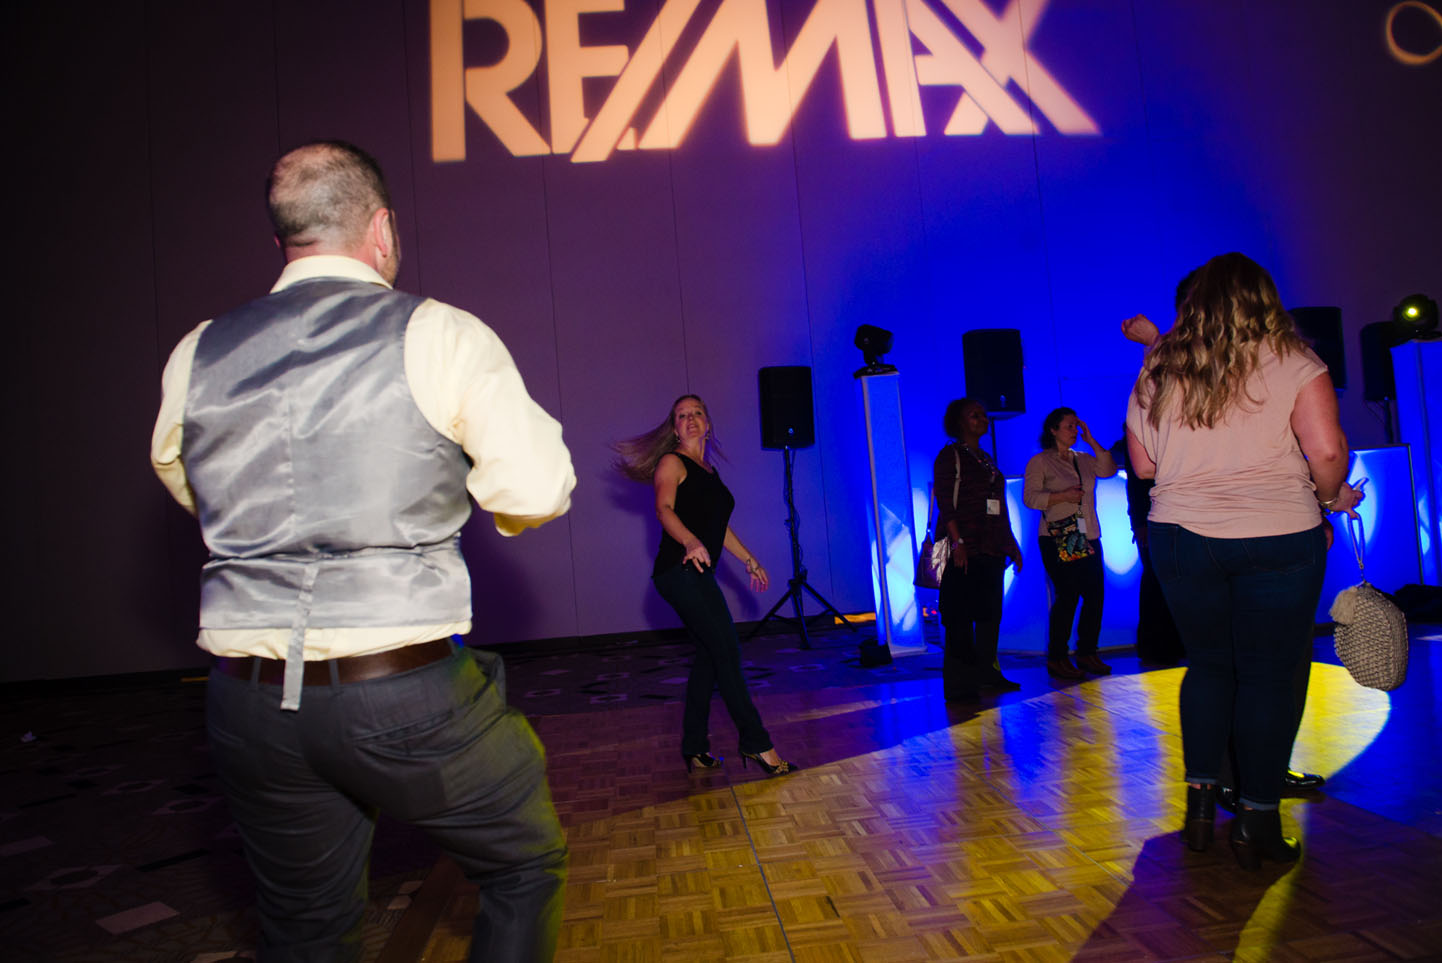 2015-12-09 ReMax Corpoarte Event - The Borgata - Atlantic City NJ - Photo Sesh - 2015-5303.jpg